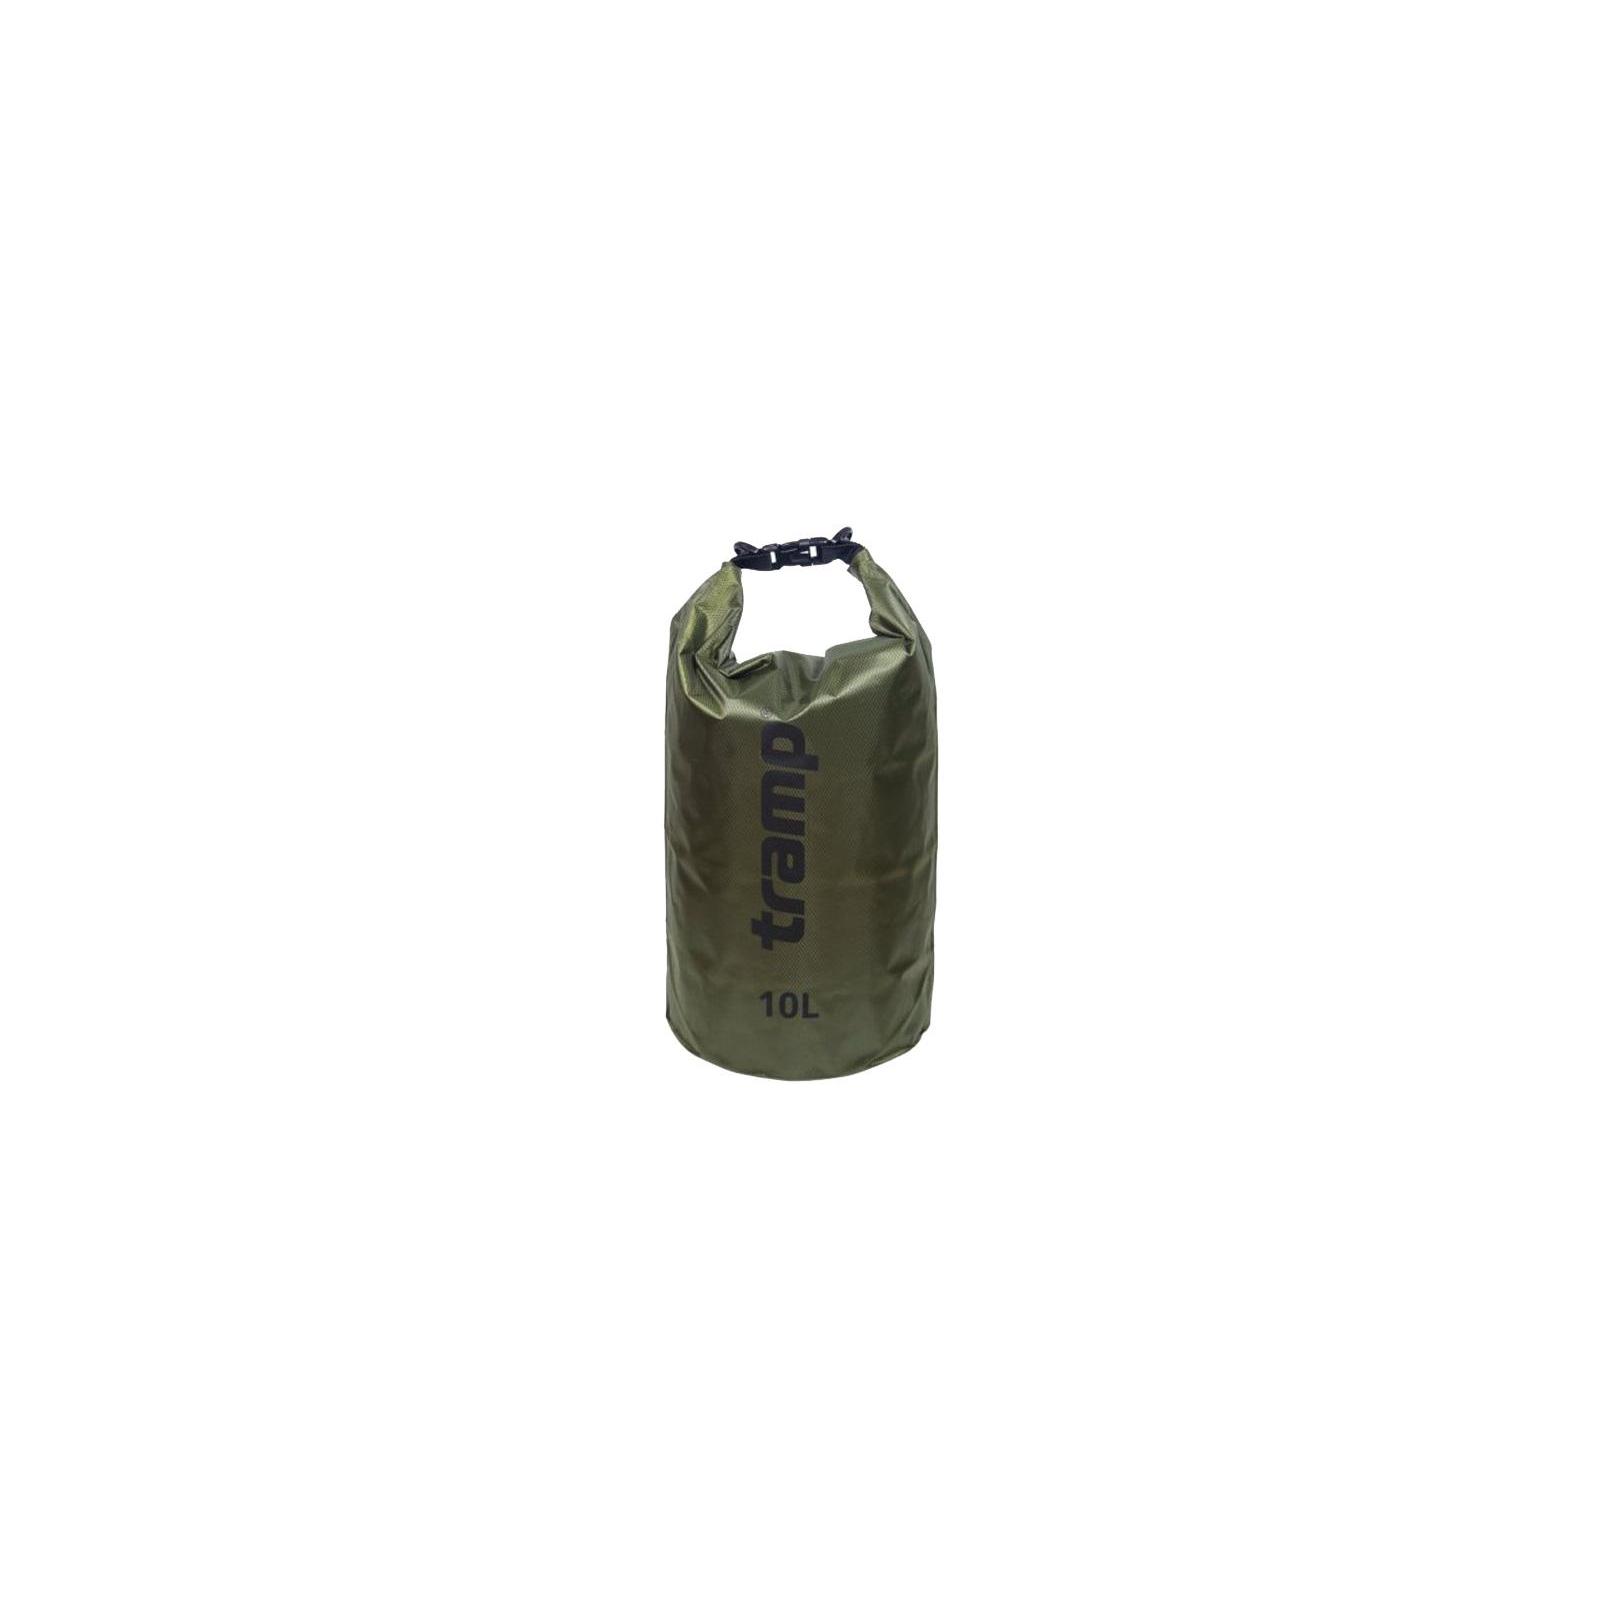 Гермомешок Tramp PVC Diamond Rip-Stop оливковый 10л (TRA-111-olive)